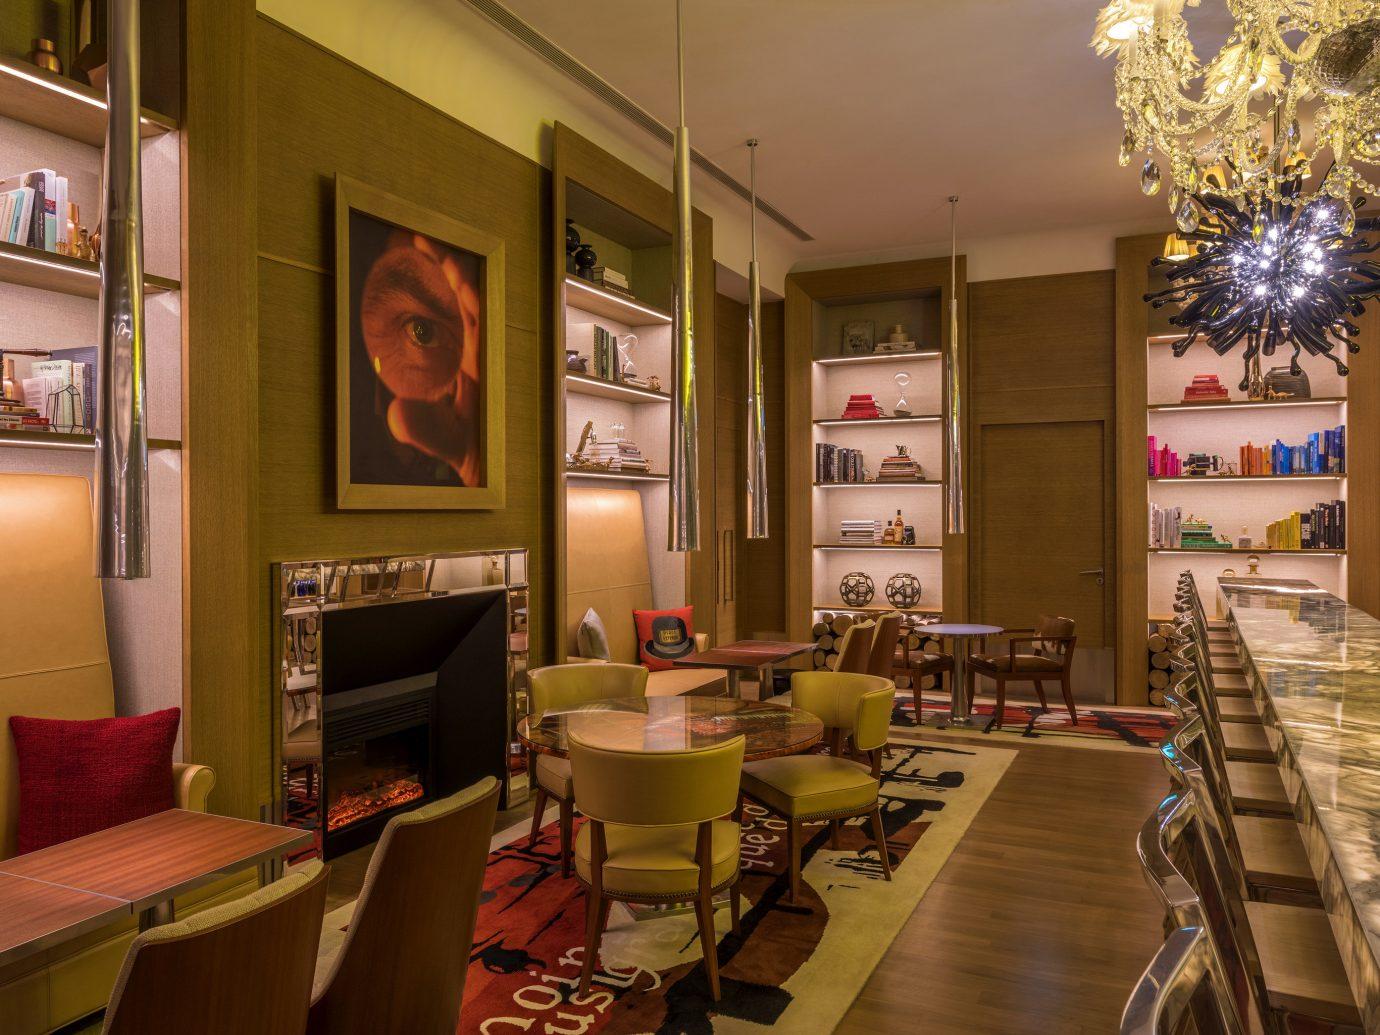 Hotels indoor room restaurant interior design café meal coffeehouse Lobby furniture area